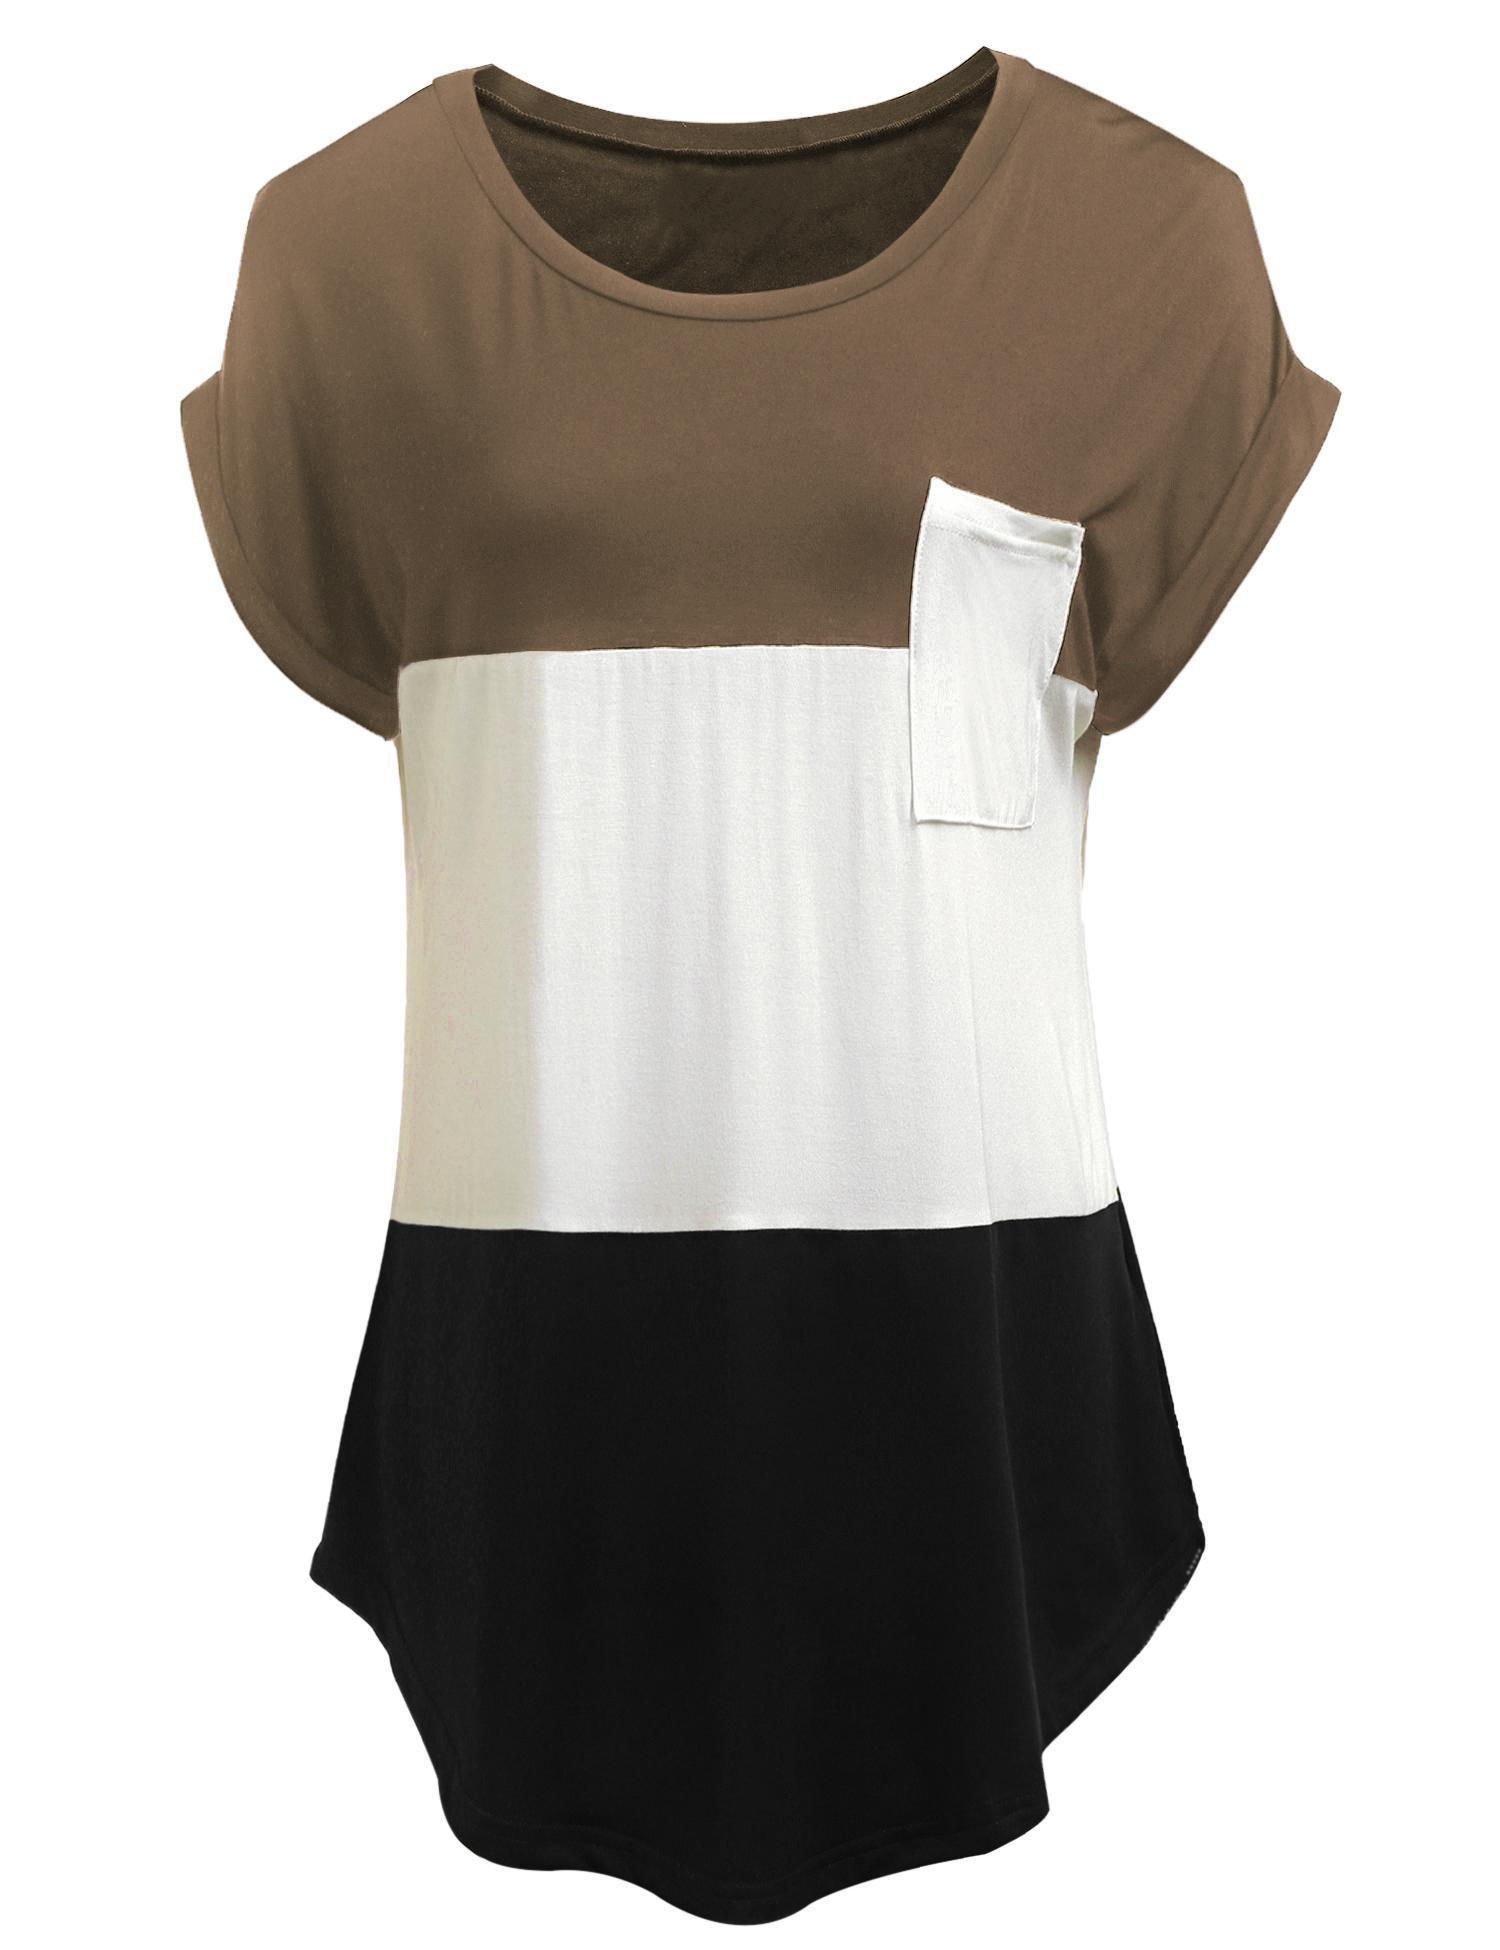 Concep Women's Summer Tops Color Block Short Sleeve Pocket T-Shirt Tunics S-XXXL